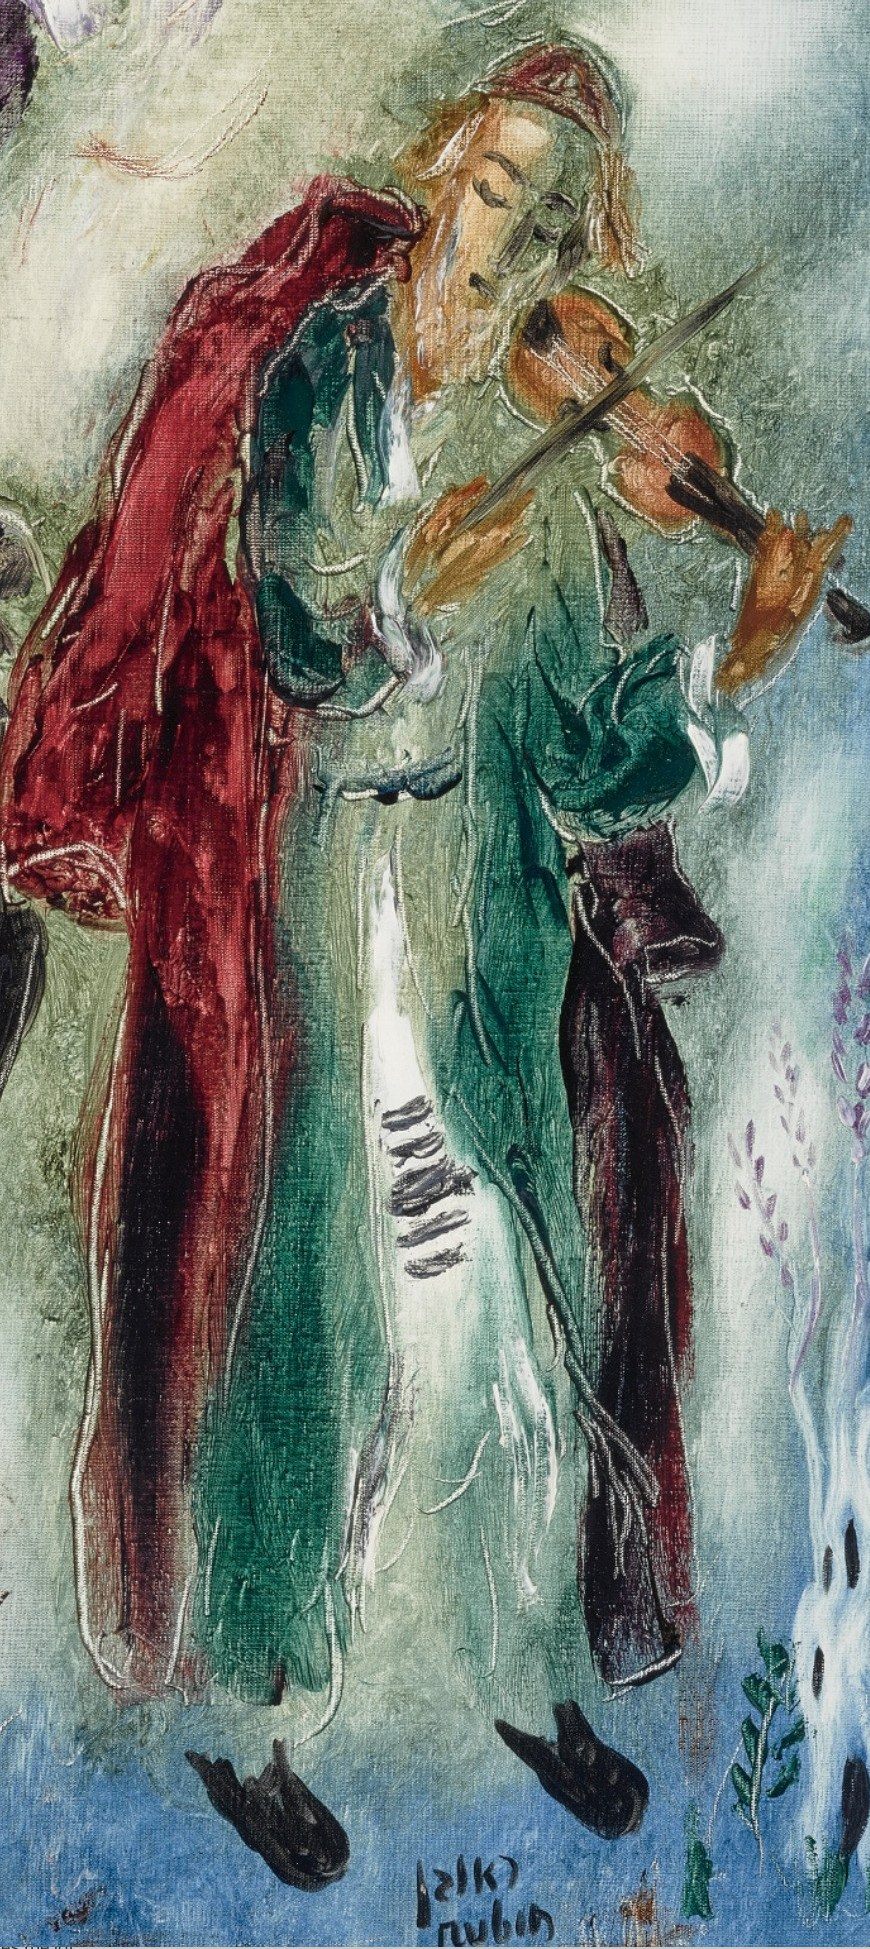 4Screenshot_2018-12-05 rubin, reuven chassidic dancers figures sotheby's n09638lot9mljlen